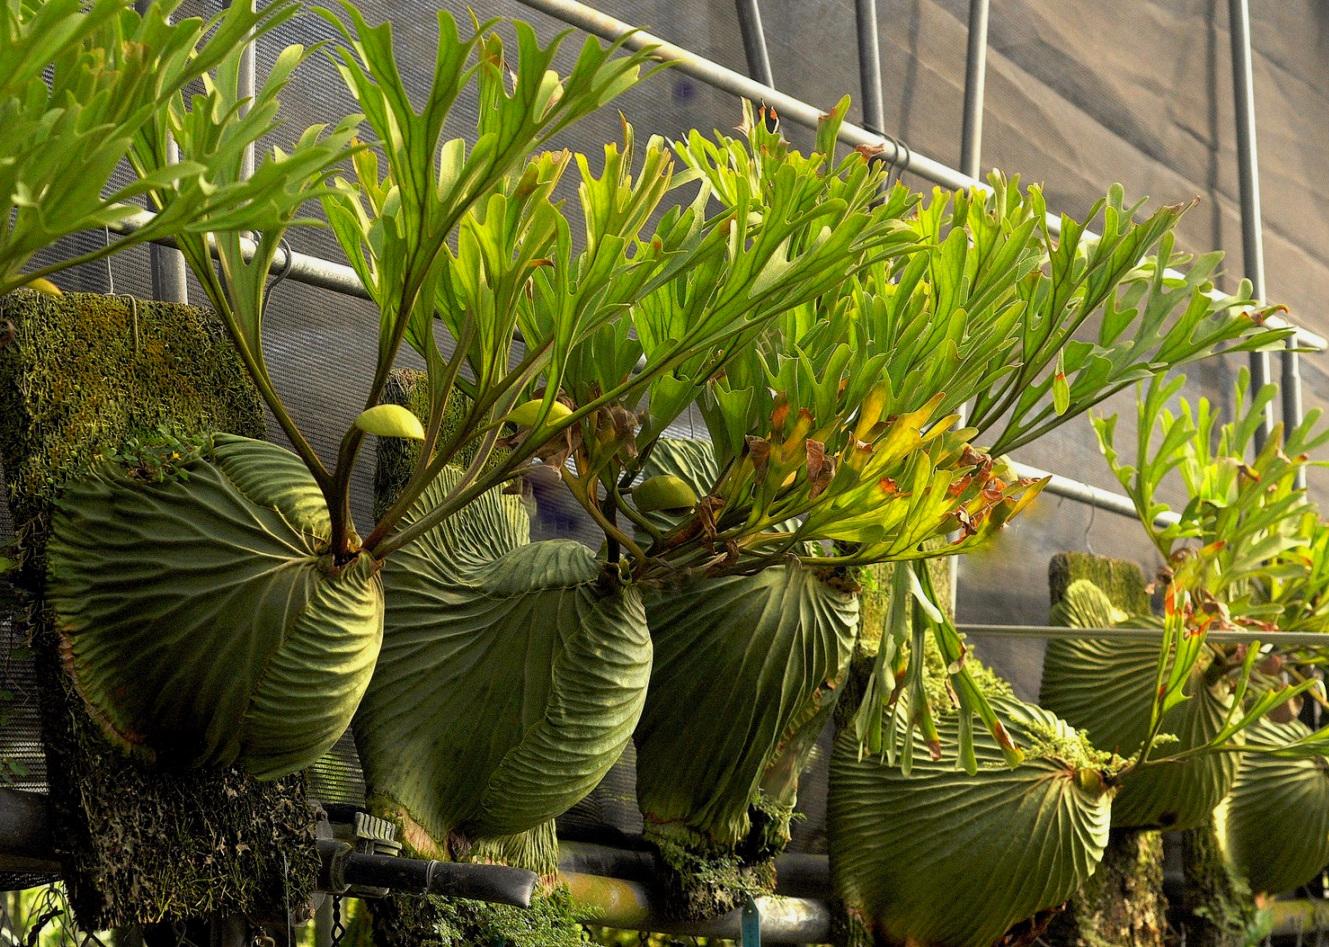 Ridley/'s staghorn fern Platycerium ridleyi spores